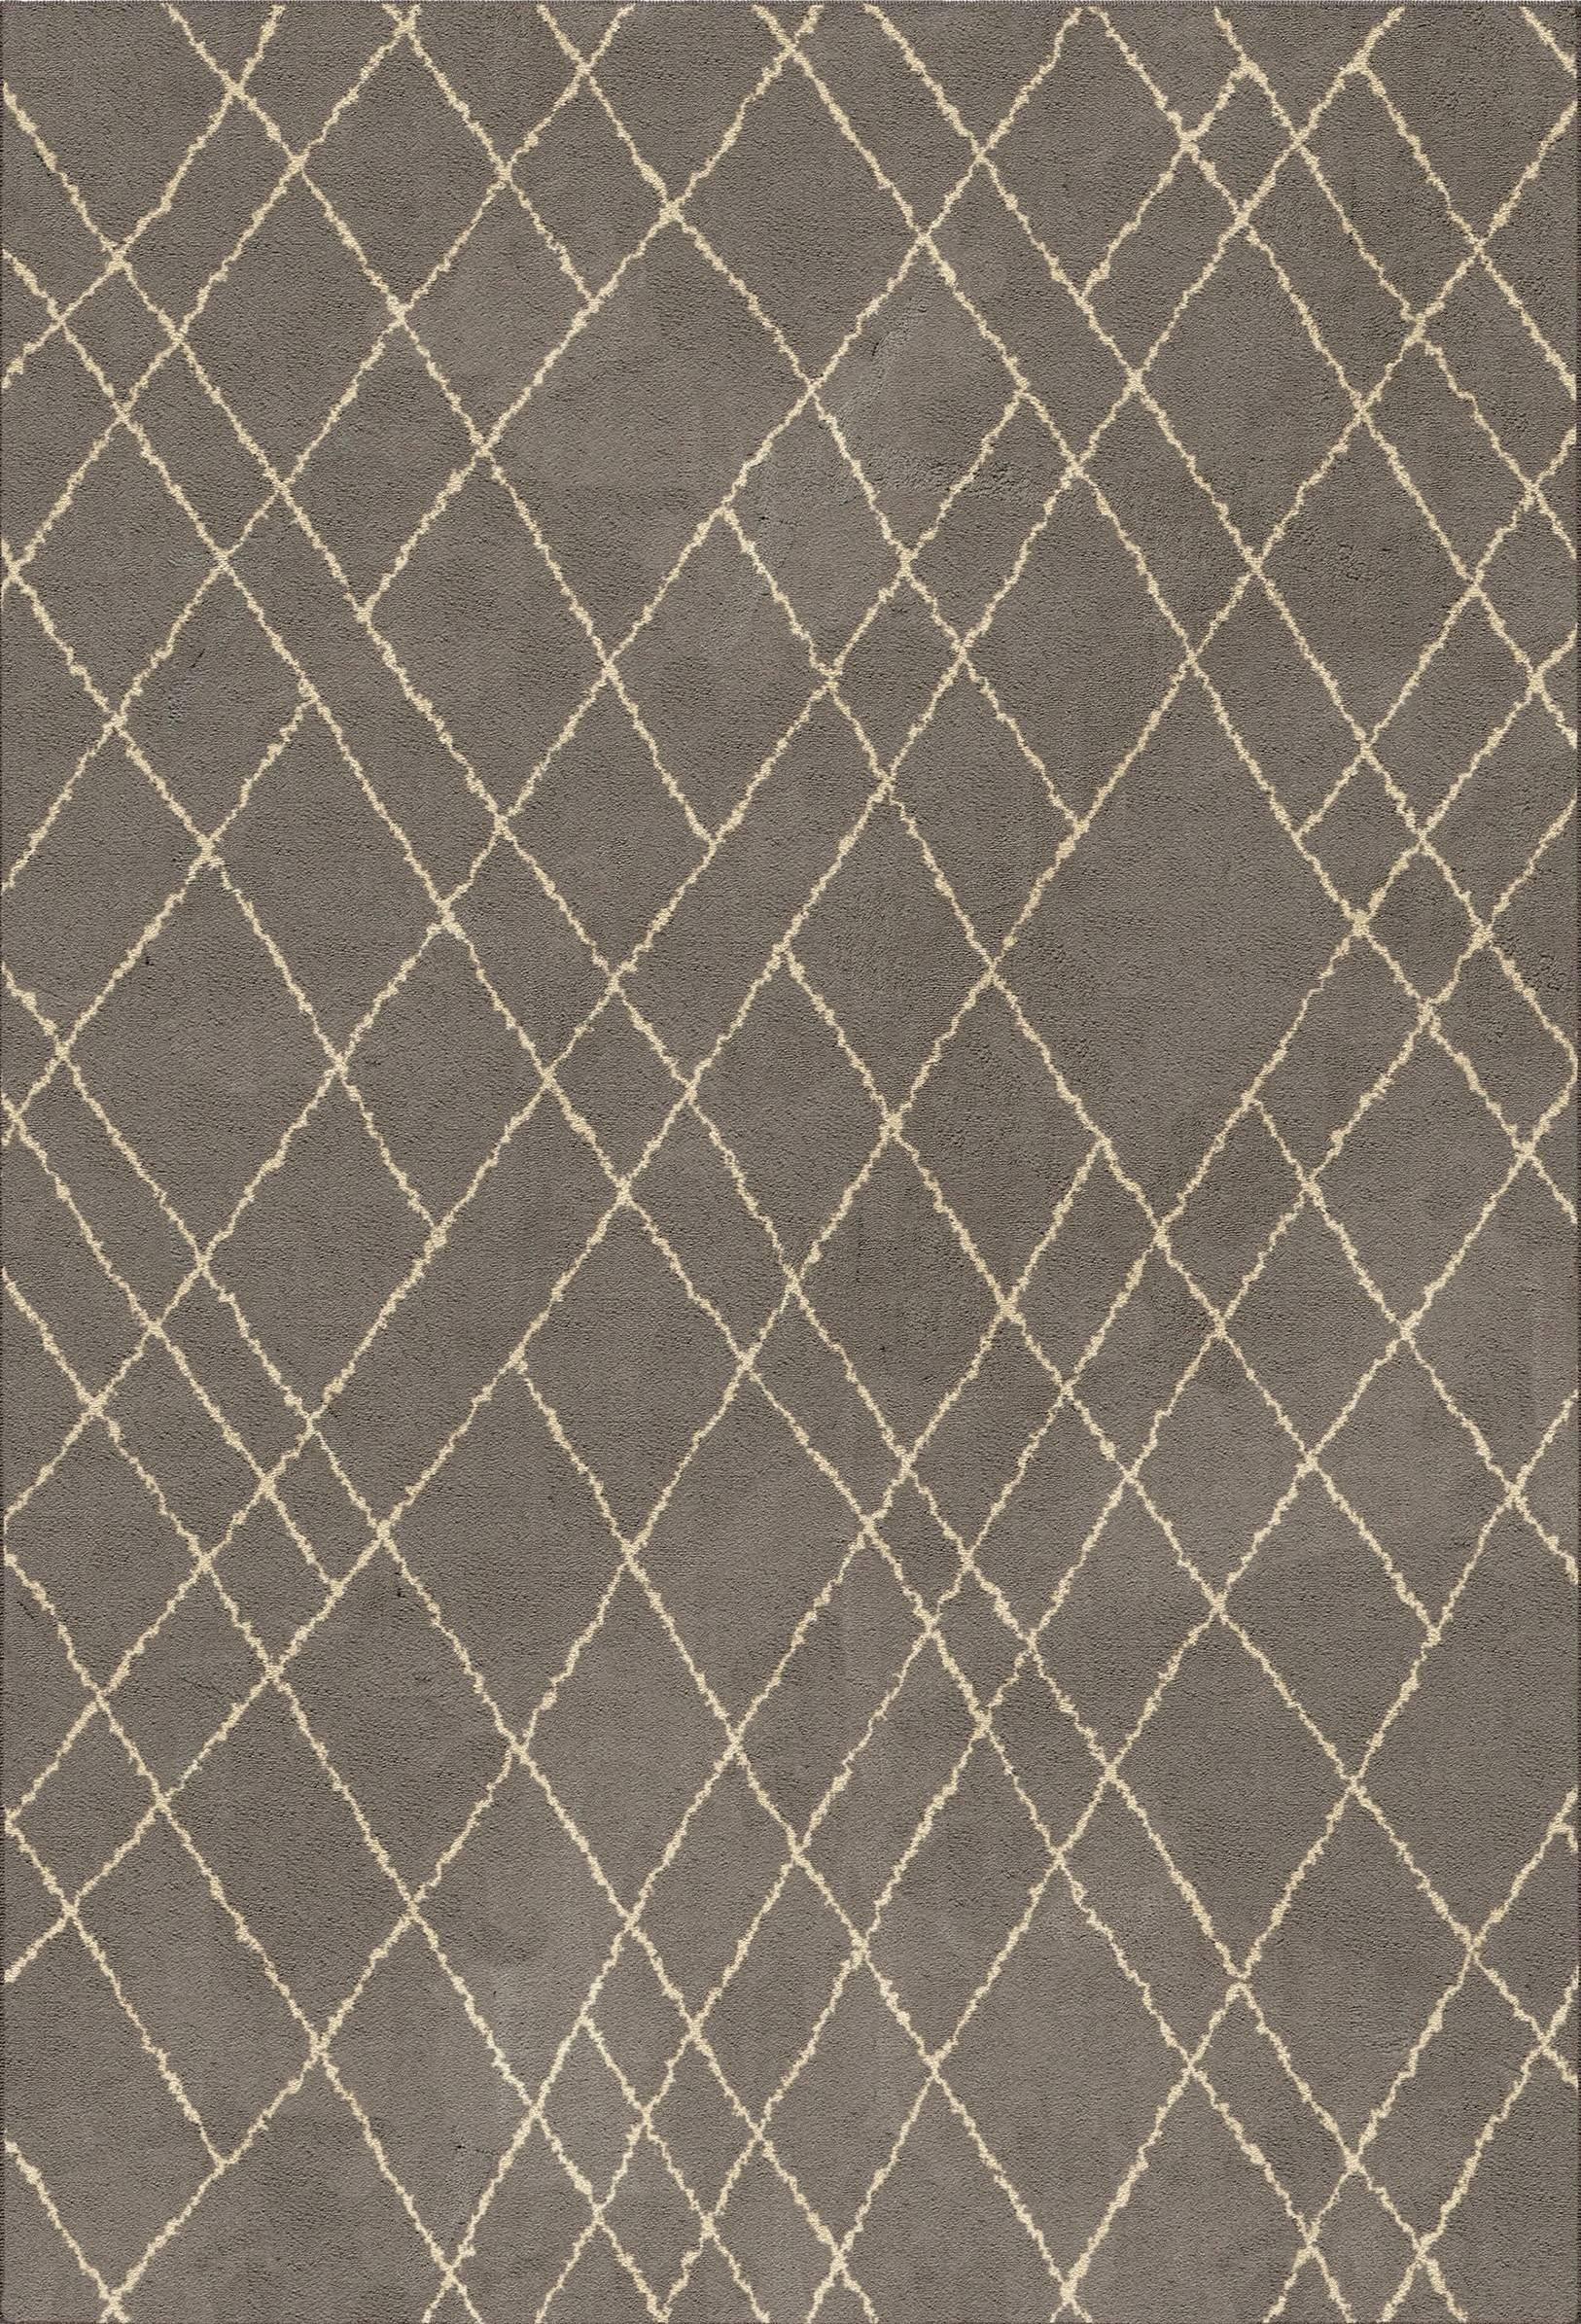 HOMEWARE Graphic Criss Cross Fleece Rug  THRESHOLD